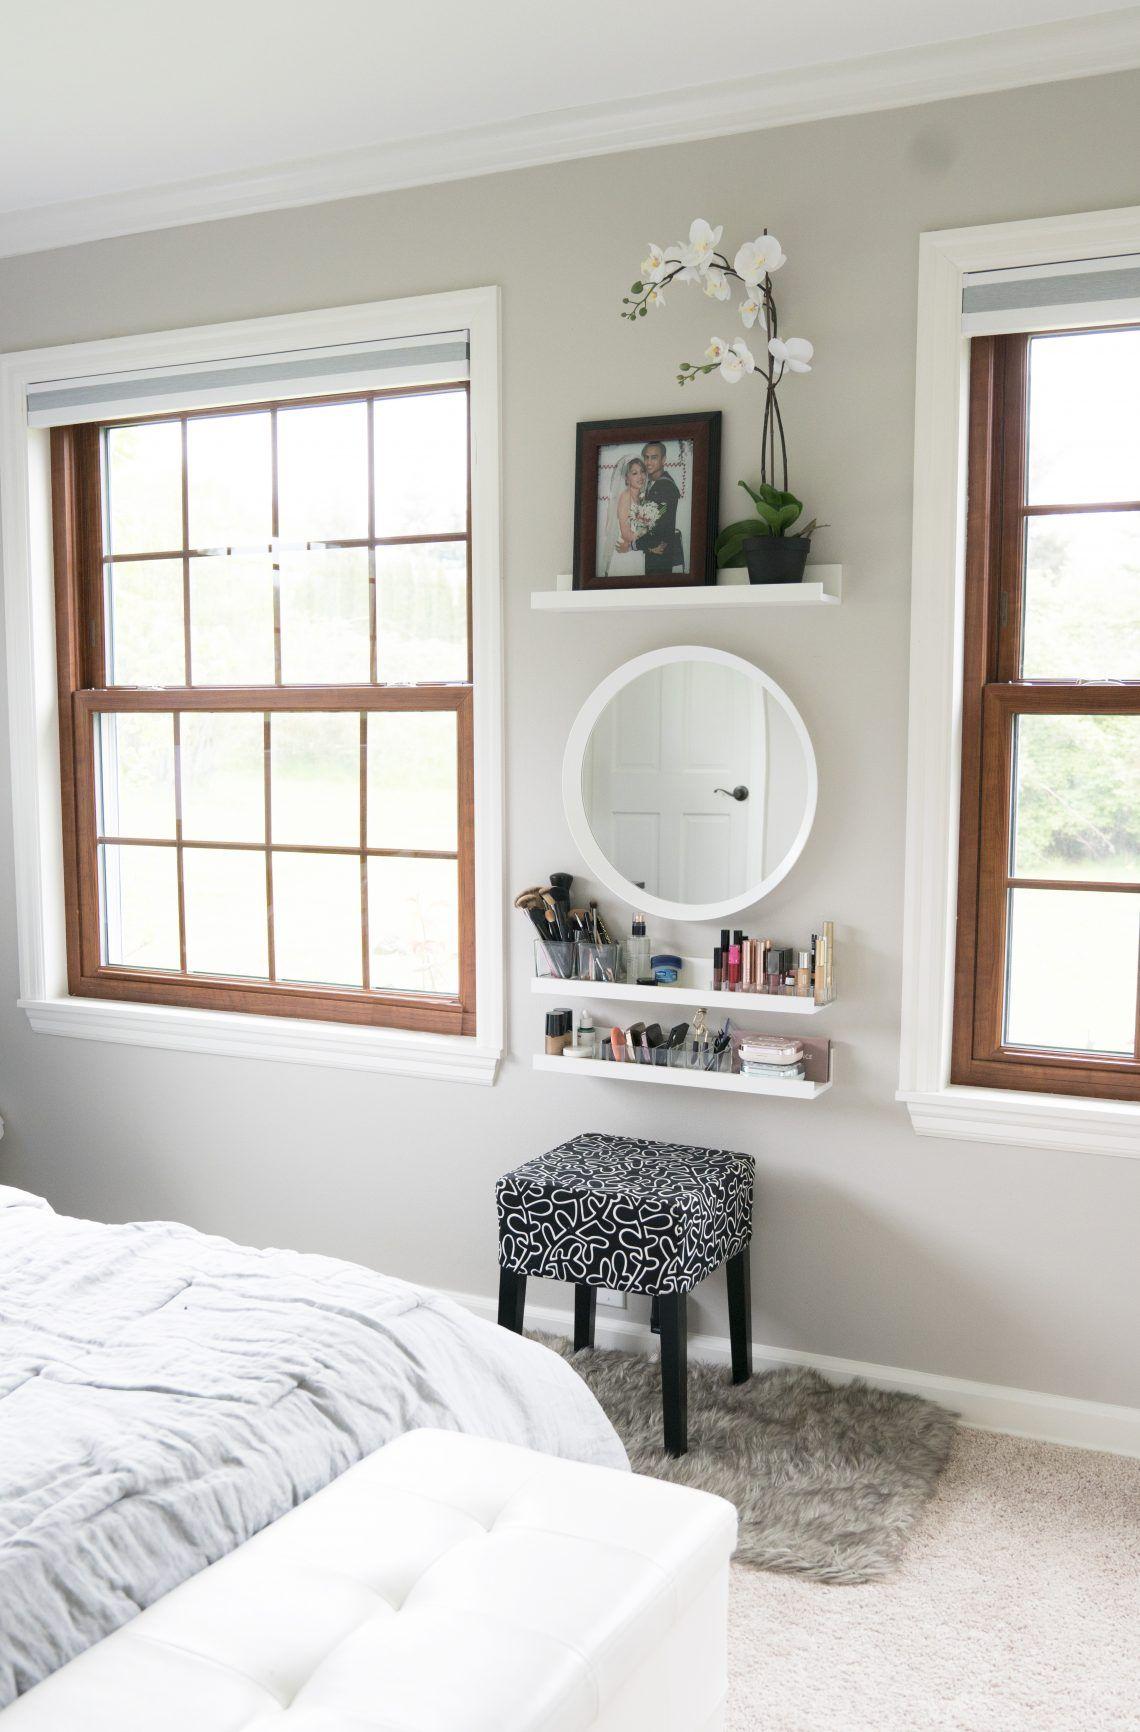 Small Bedroom Vanity: Makeup Vanity For Small Spaces & Bedrooms